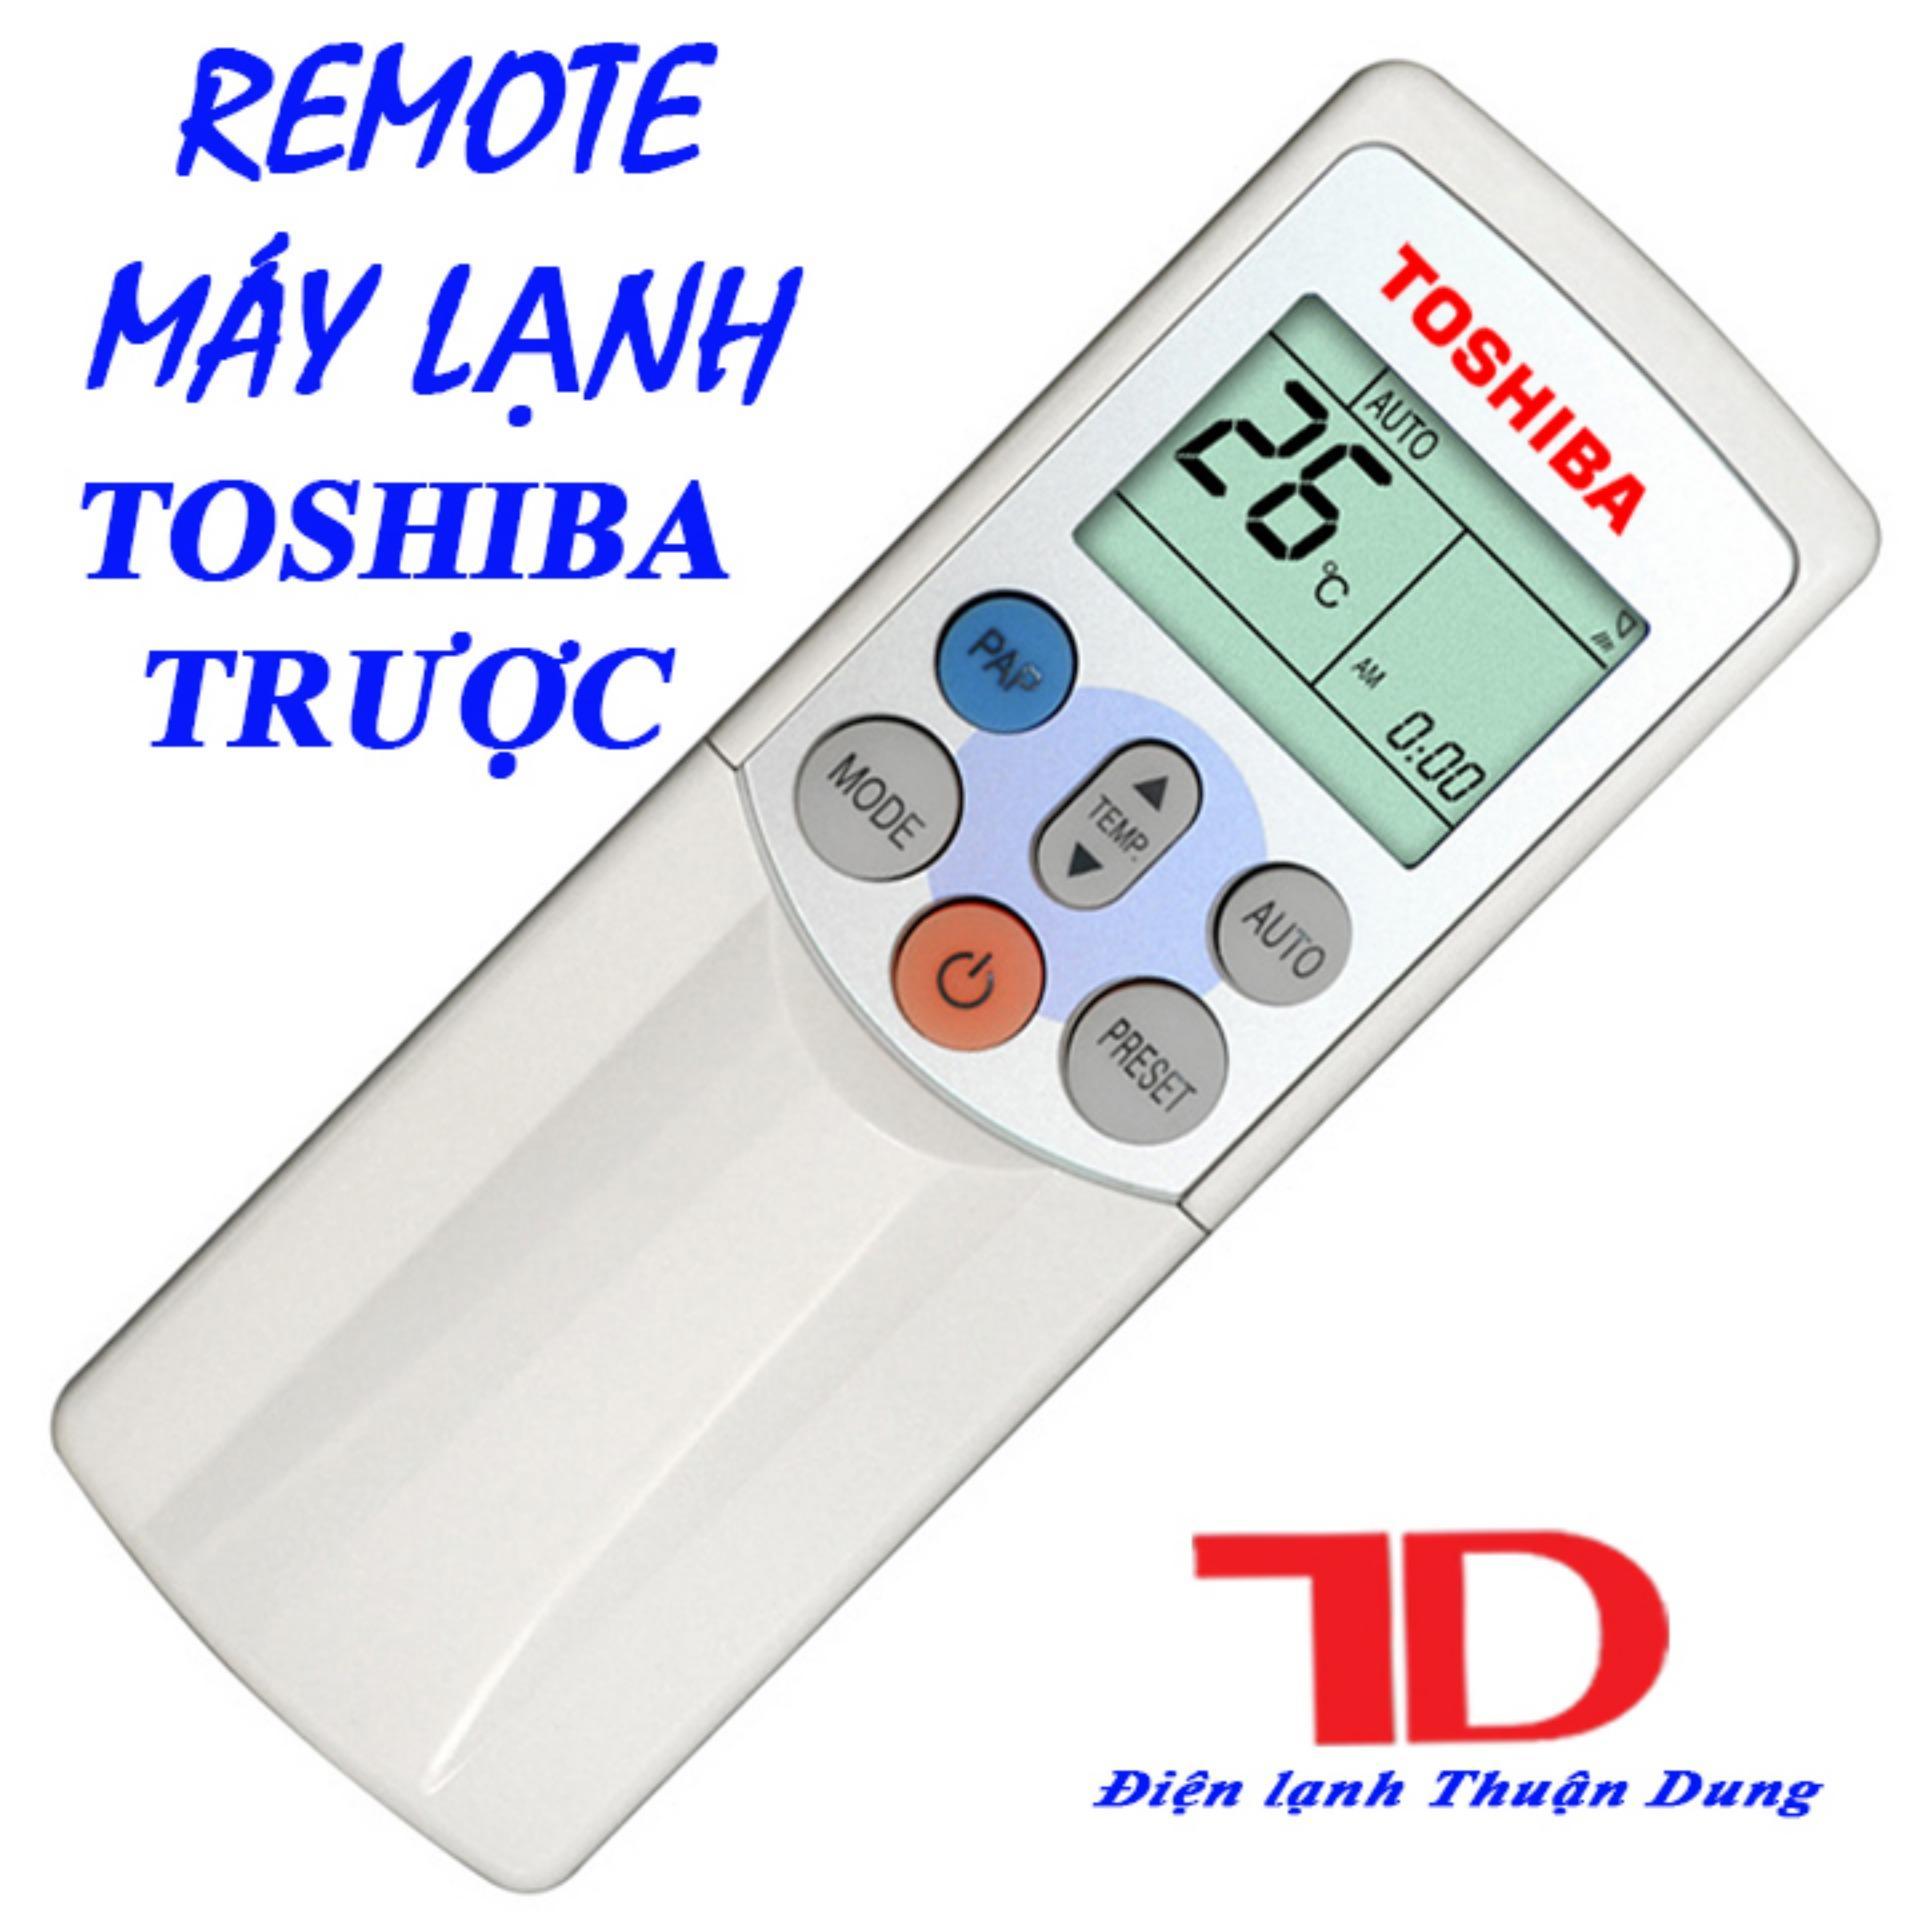 Remote máy lạnh Toshiba